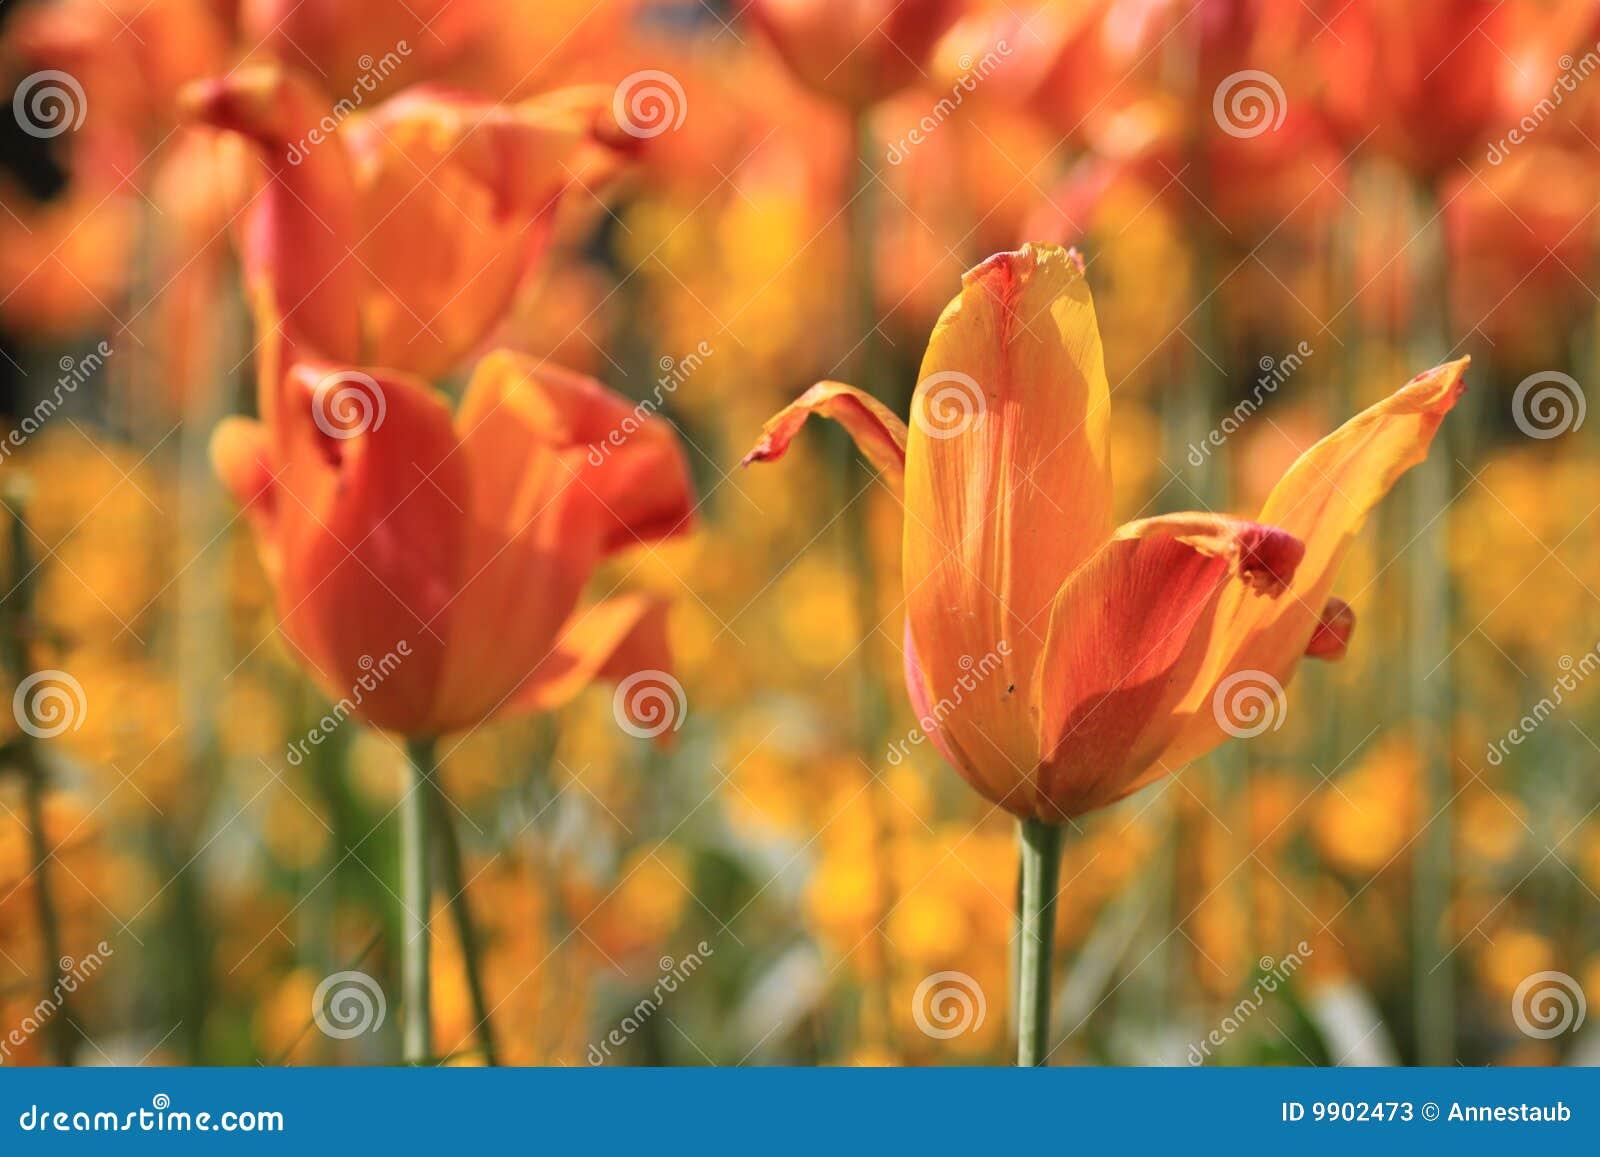 Tulipani arancioni di fioritura fotografie stock for Tulipani arancioni